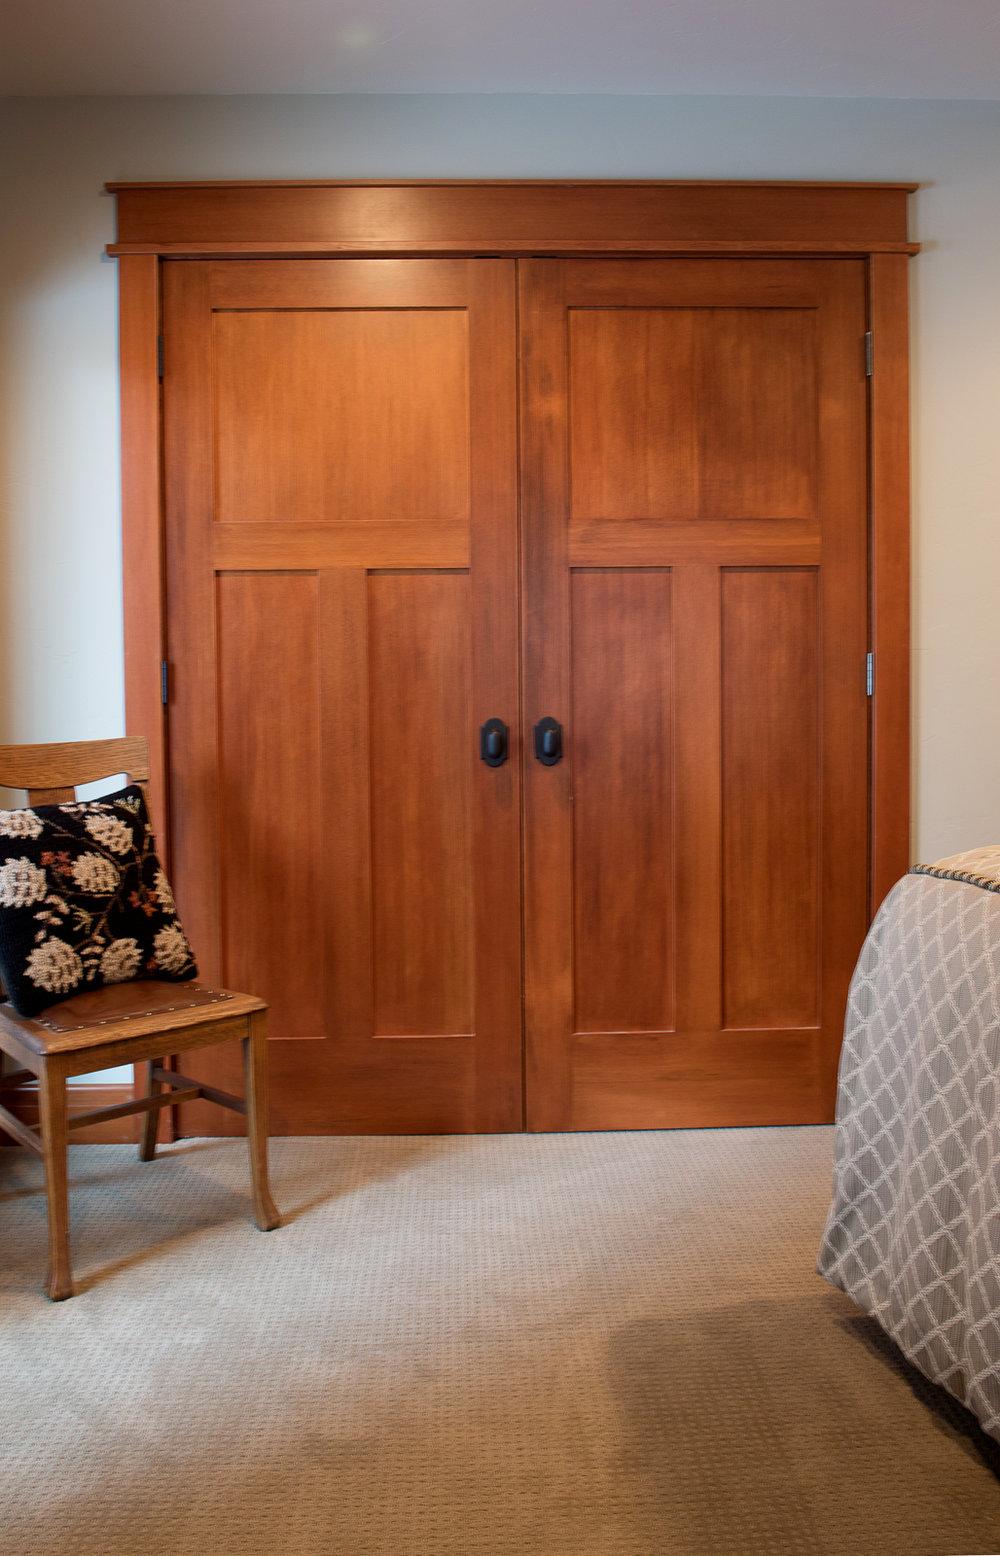 Woodworks-West-Bozeman-Montana-Builder-Cabinetry-Remodel-New-Construction-3659.jpg